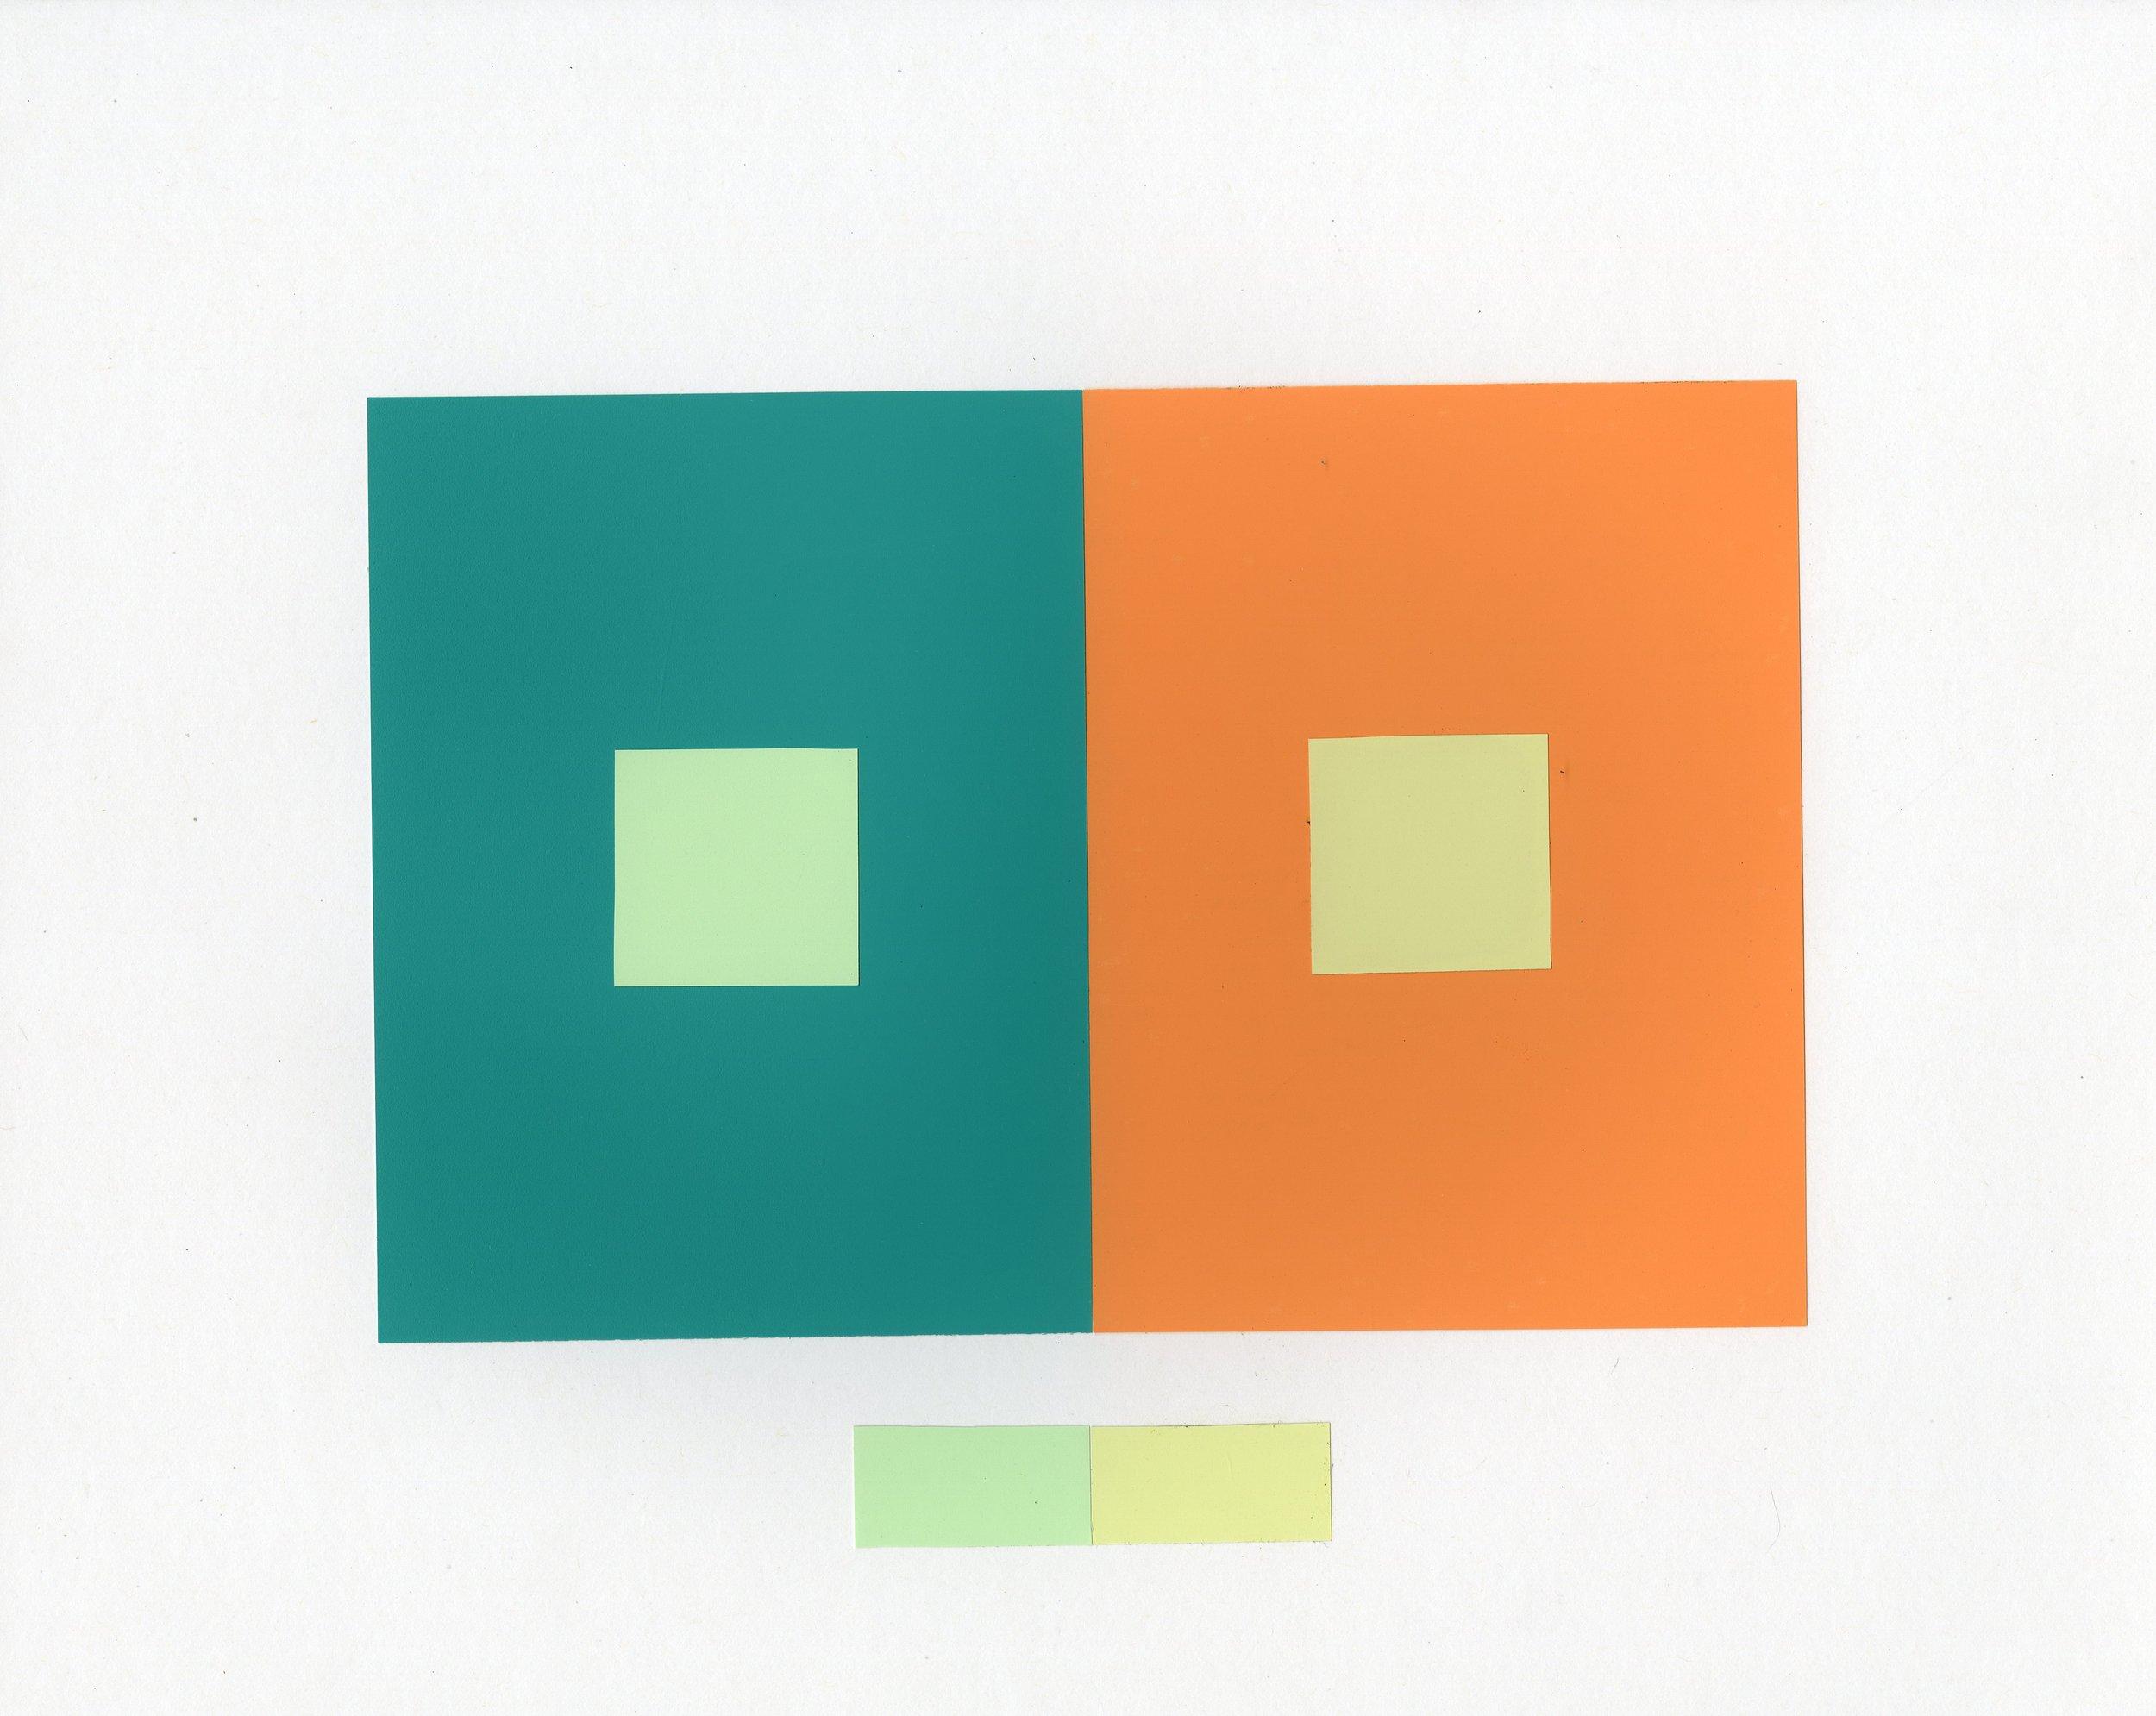 2D Foundations Simultaneous Contrast